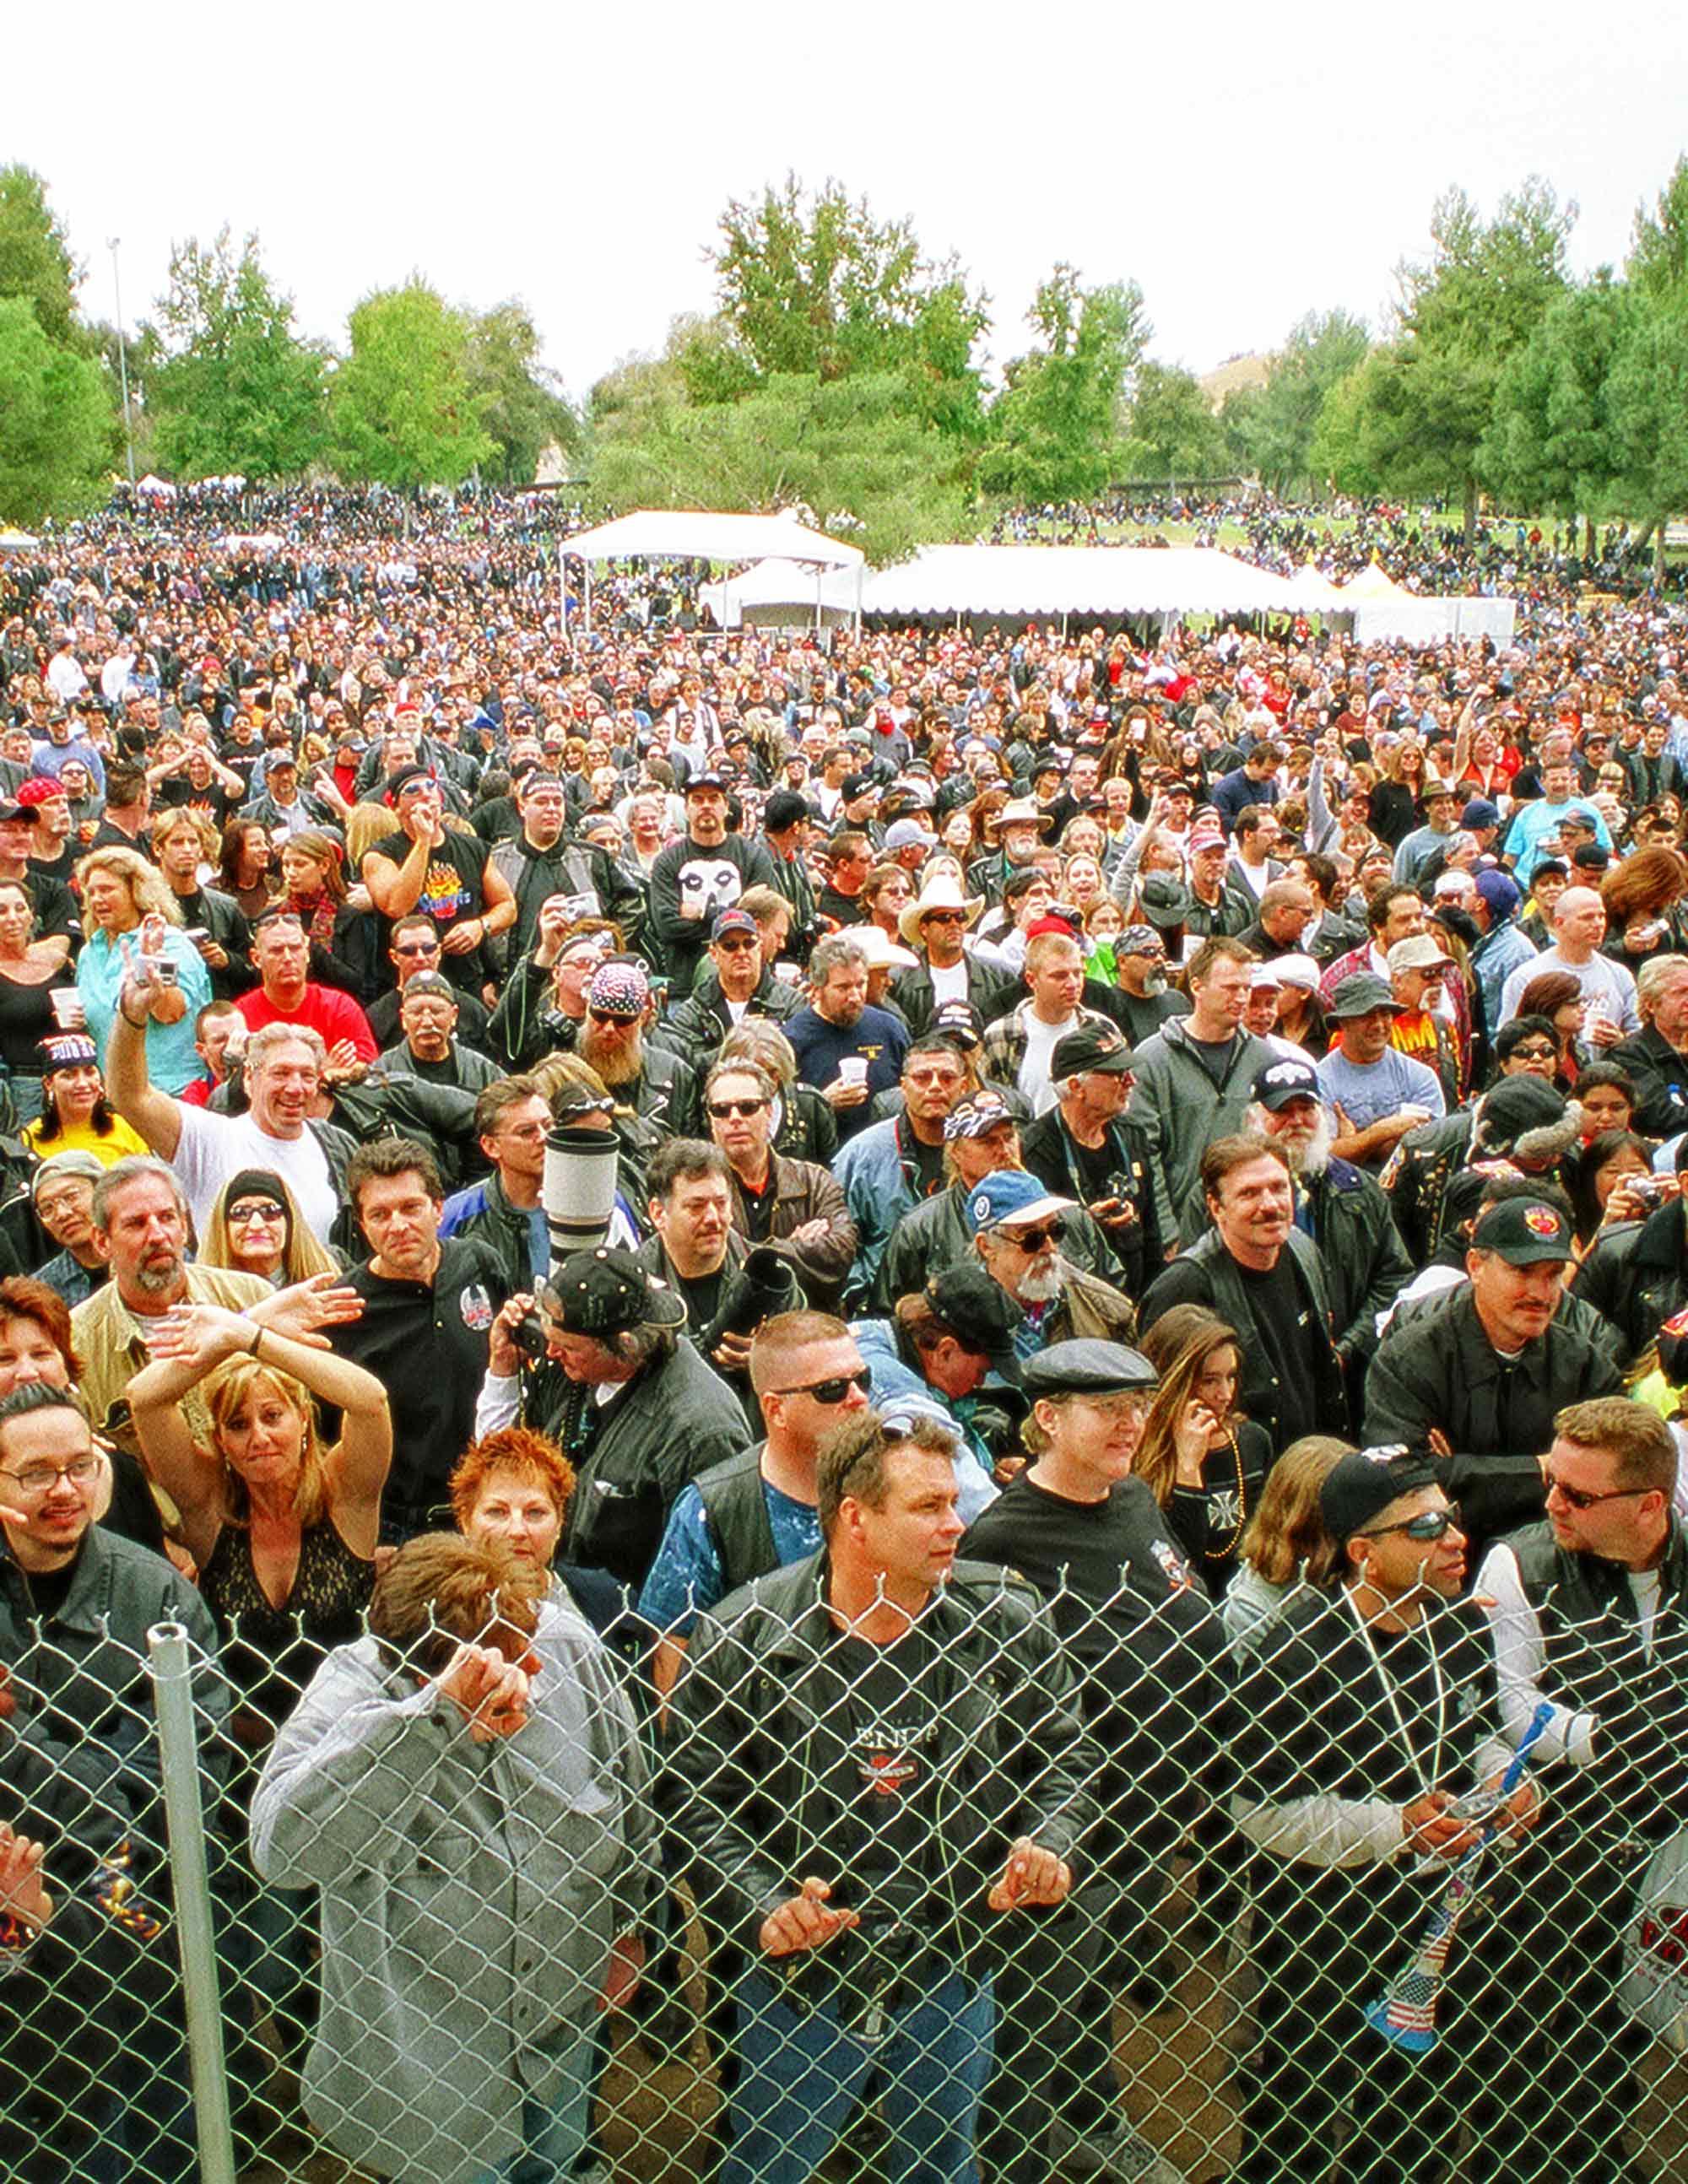 crowd2-2000.jpg